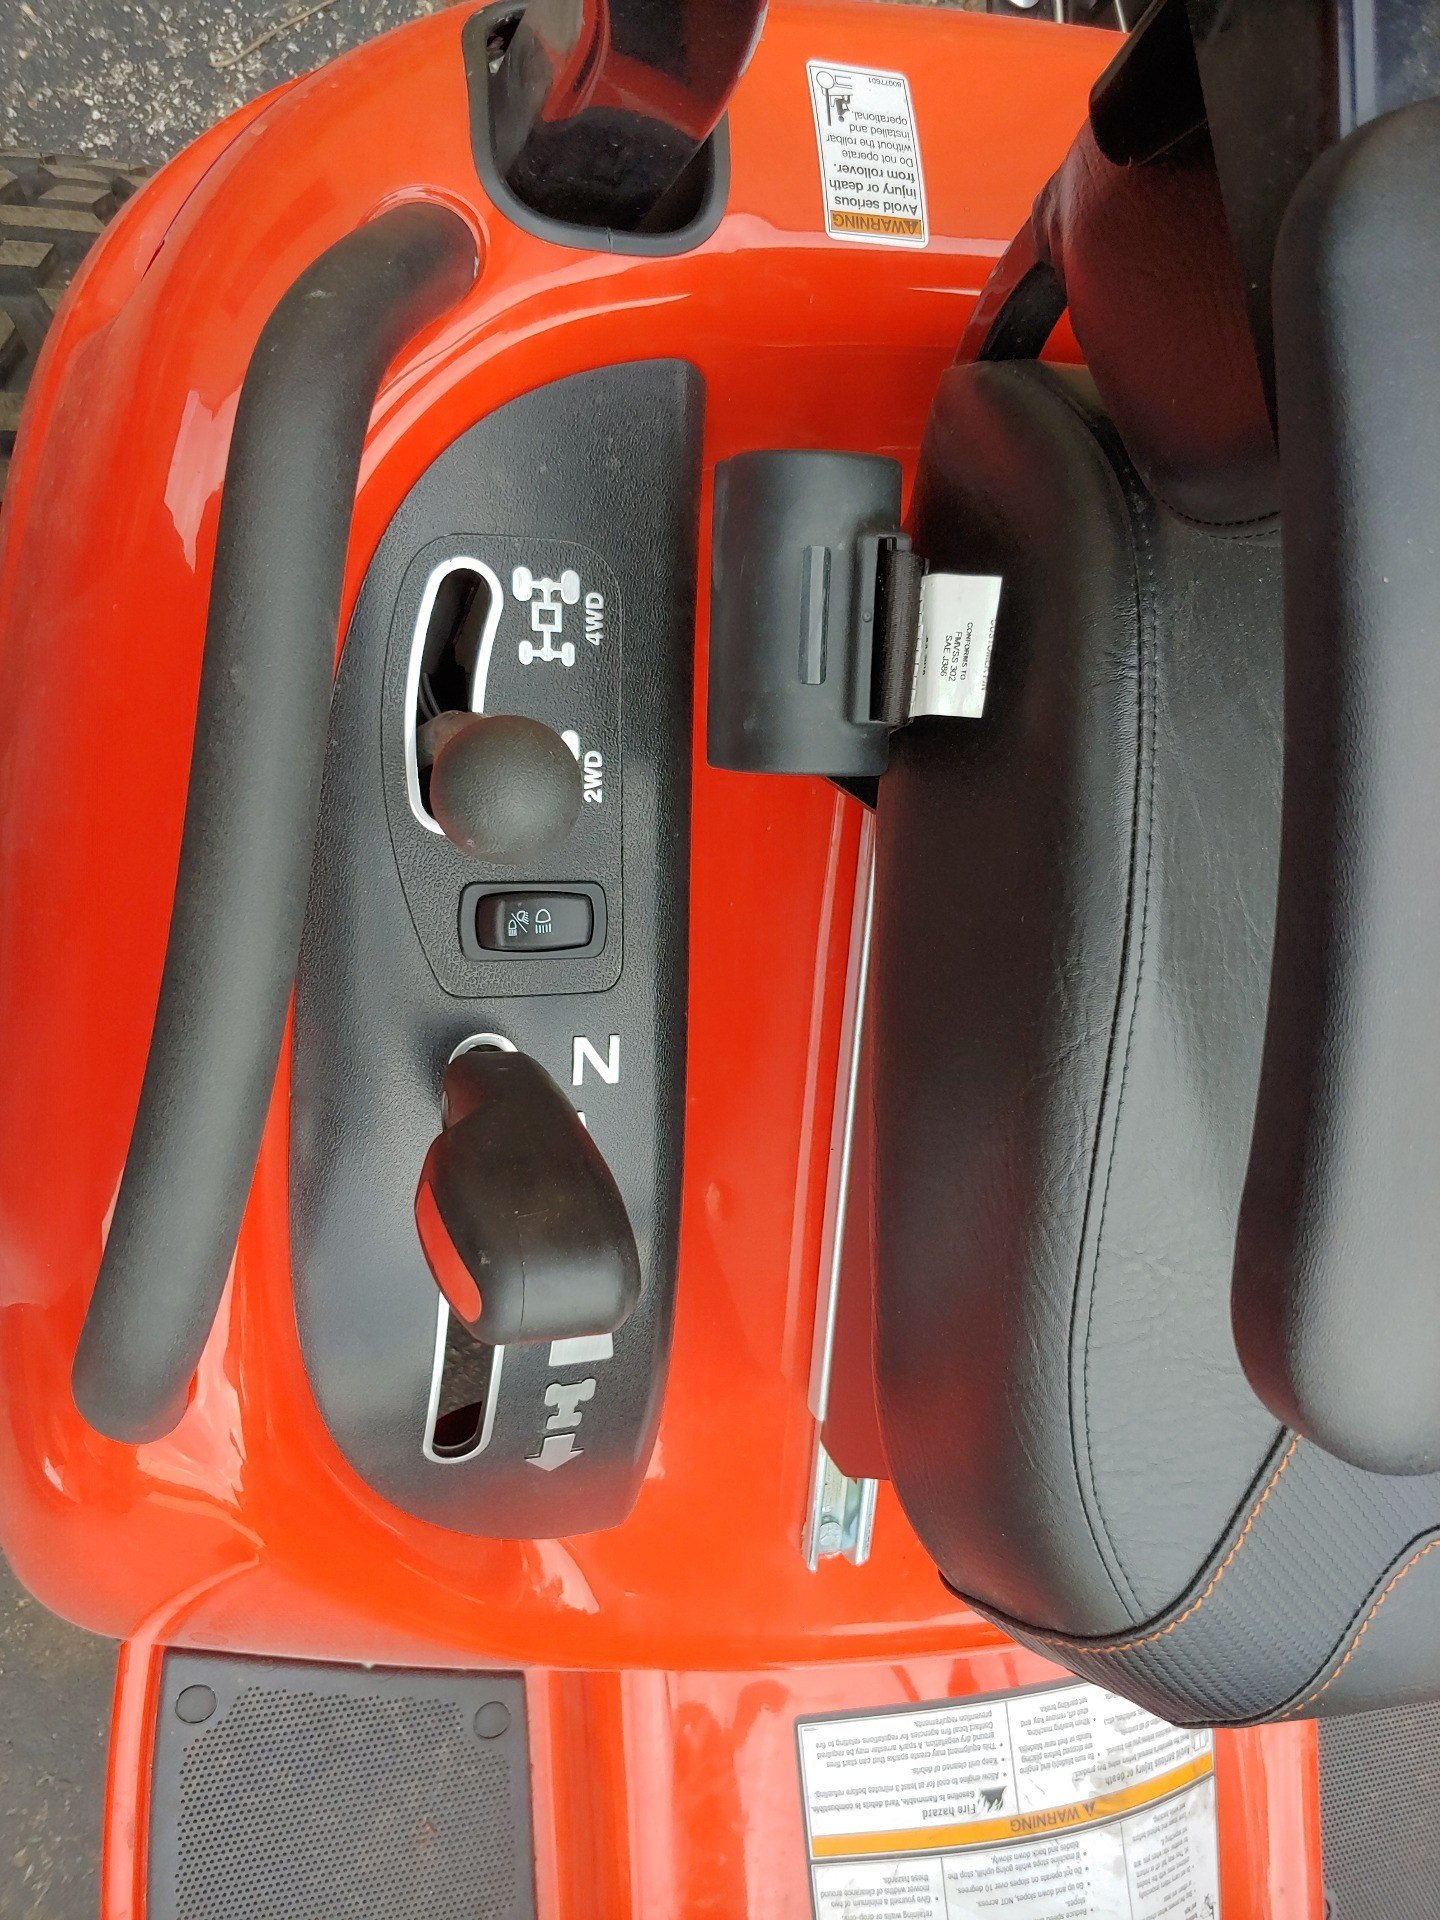 2018  Legacy XL 33 4WD 540 Rear PTO 5